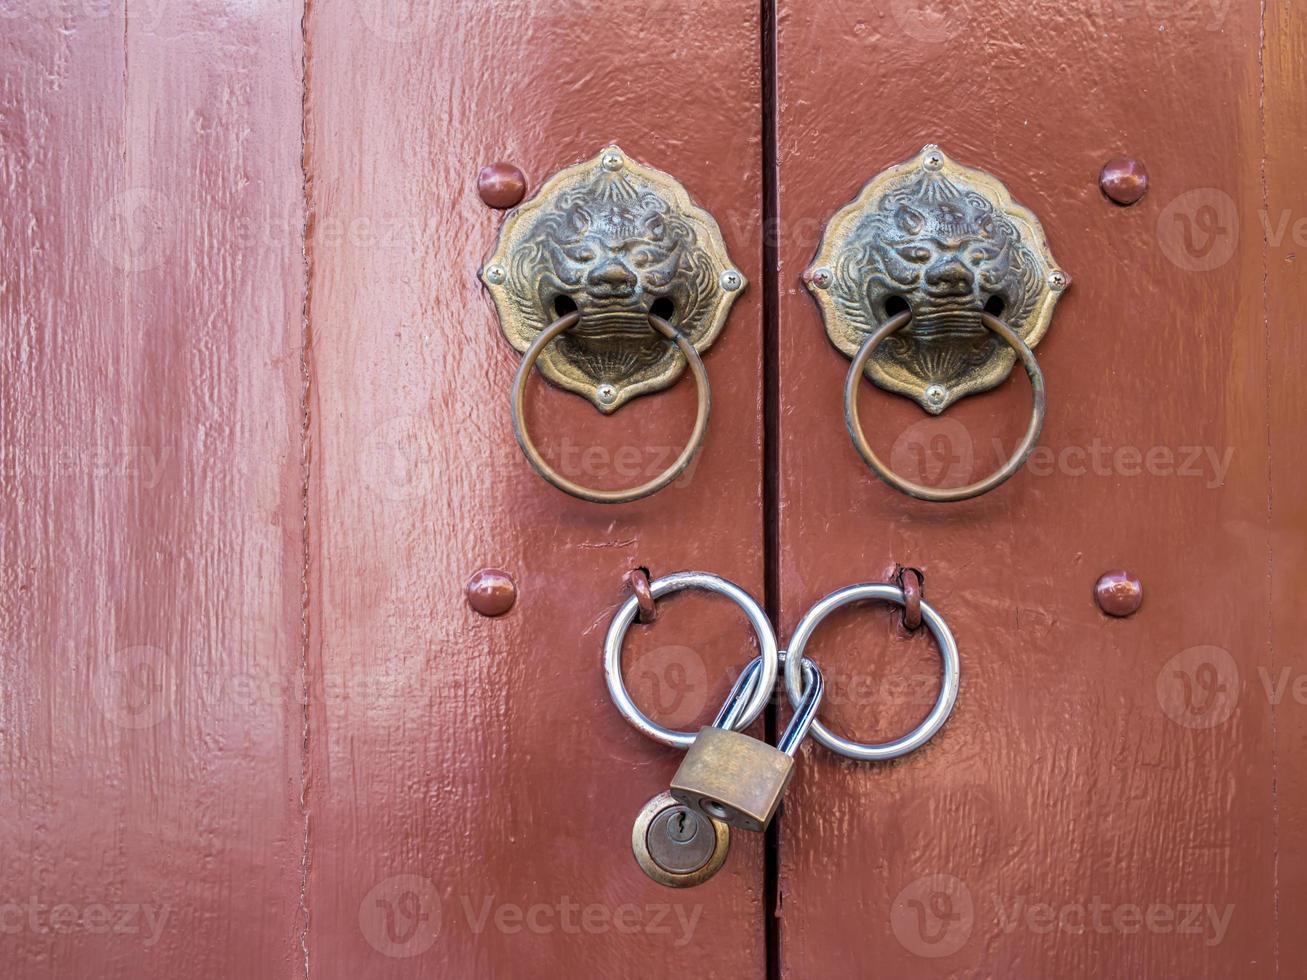 Anciennes mains rondes traditionnelles chinoises avec cadenas photo